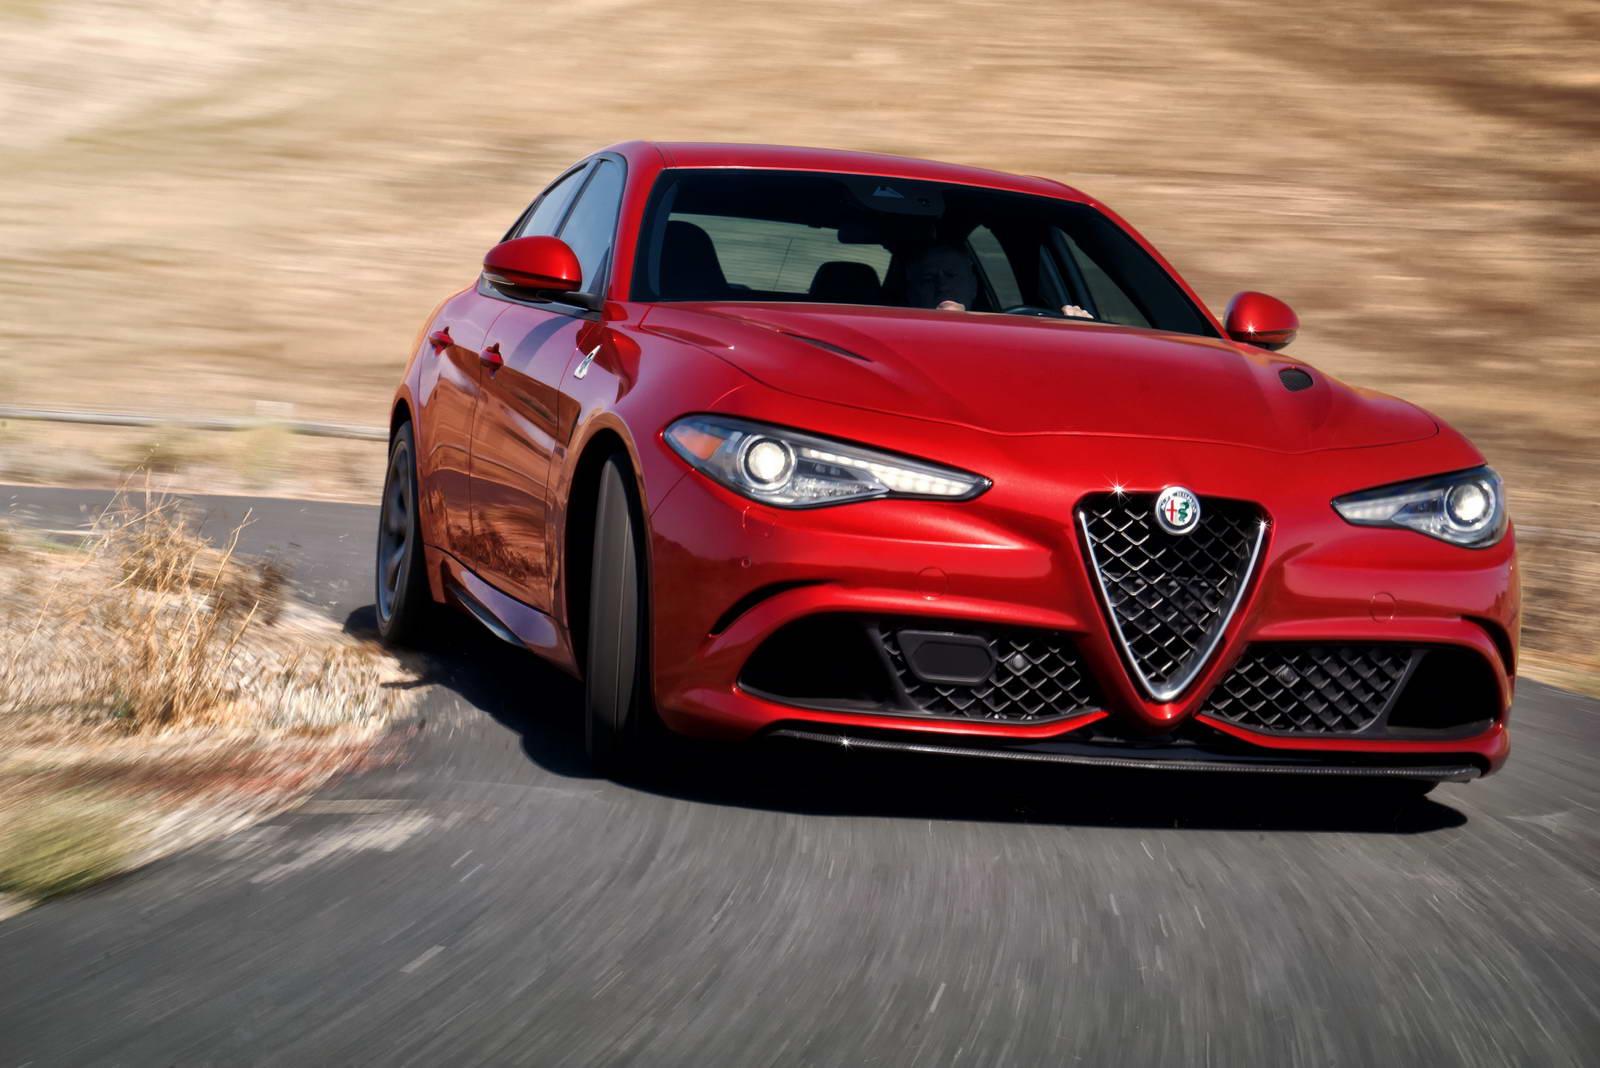 US-Spec 2017 Alfa Romeo Giulia Will Get 2L Turbo With 276